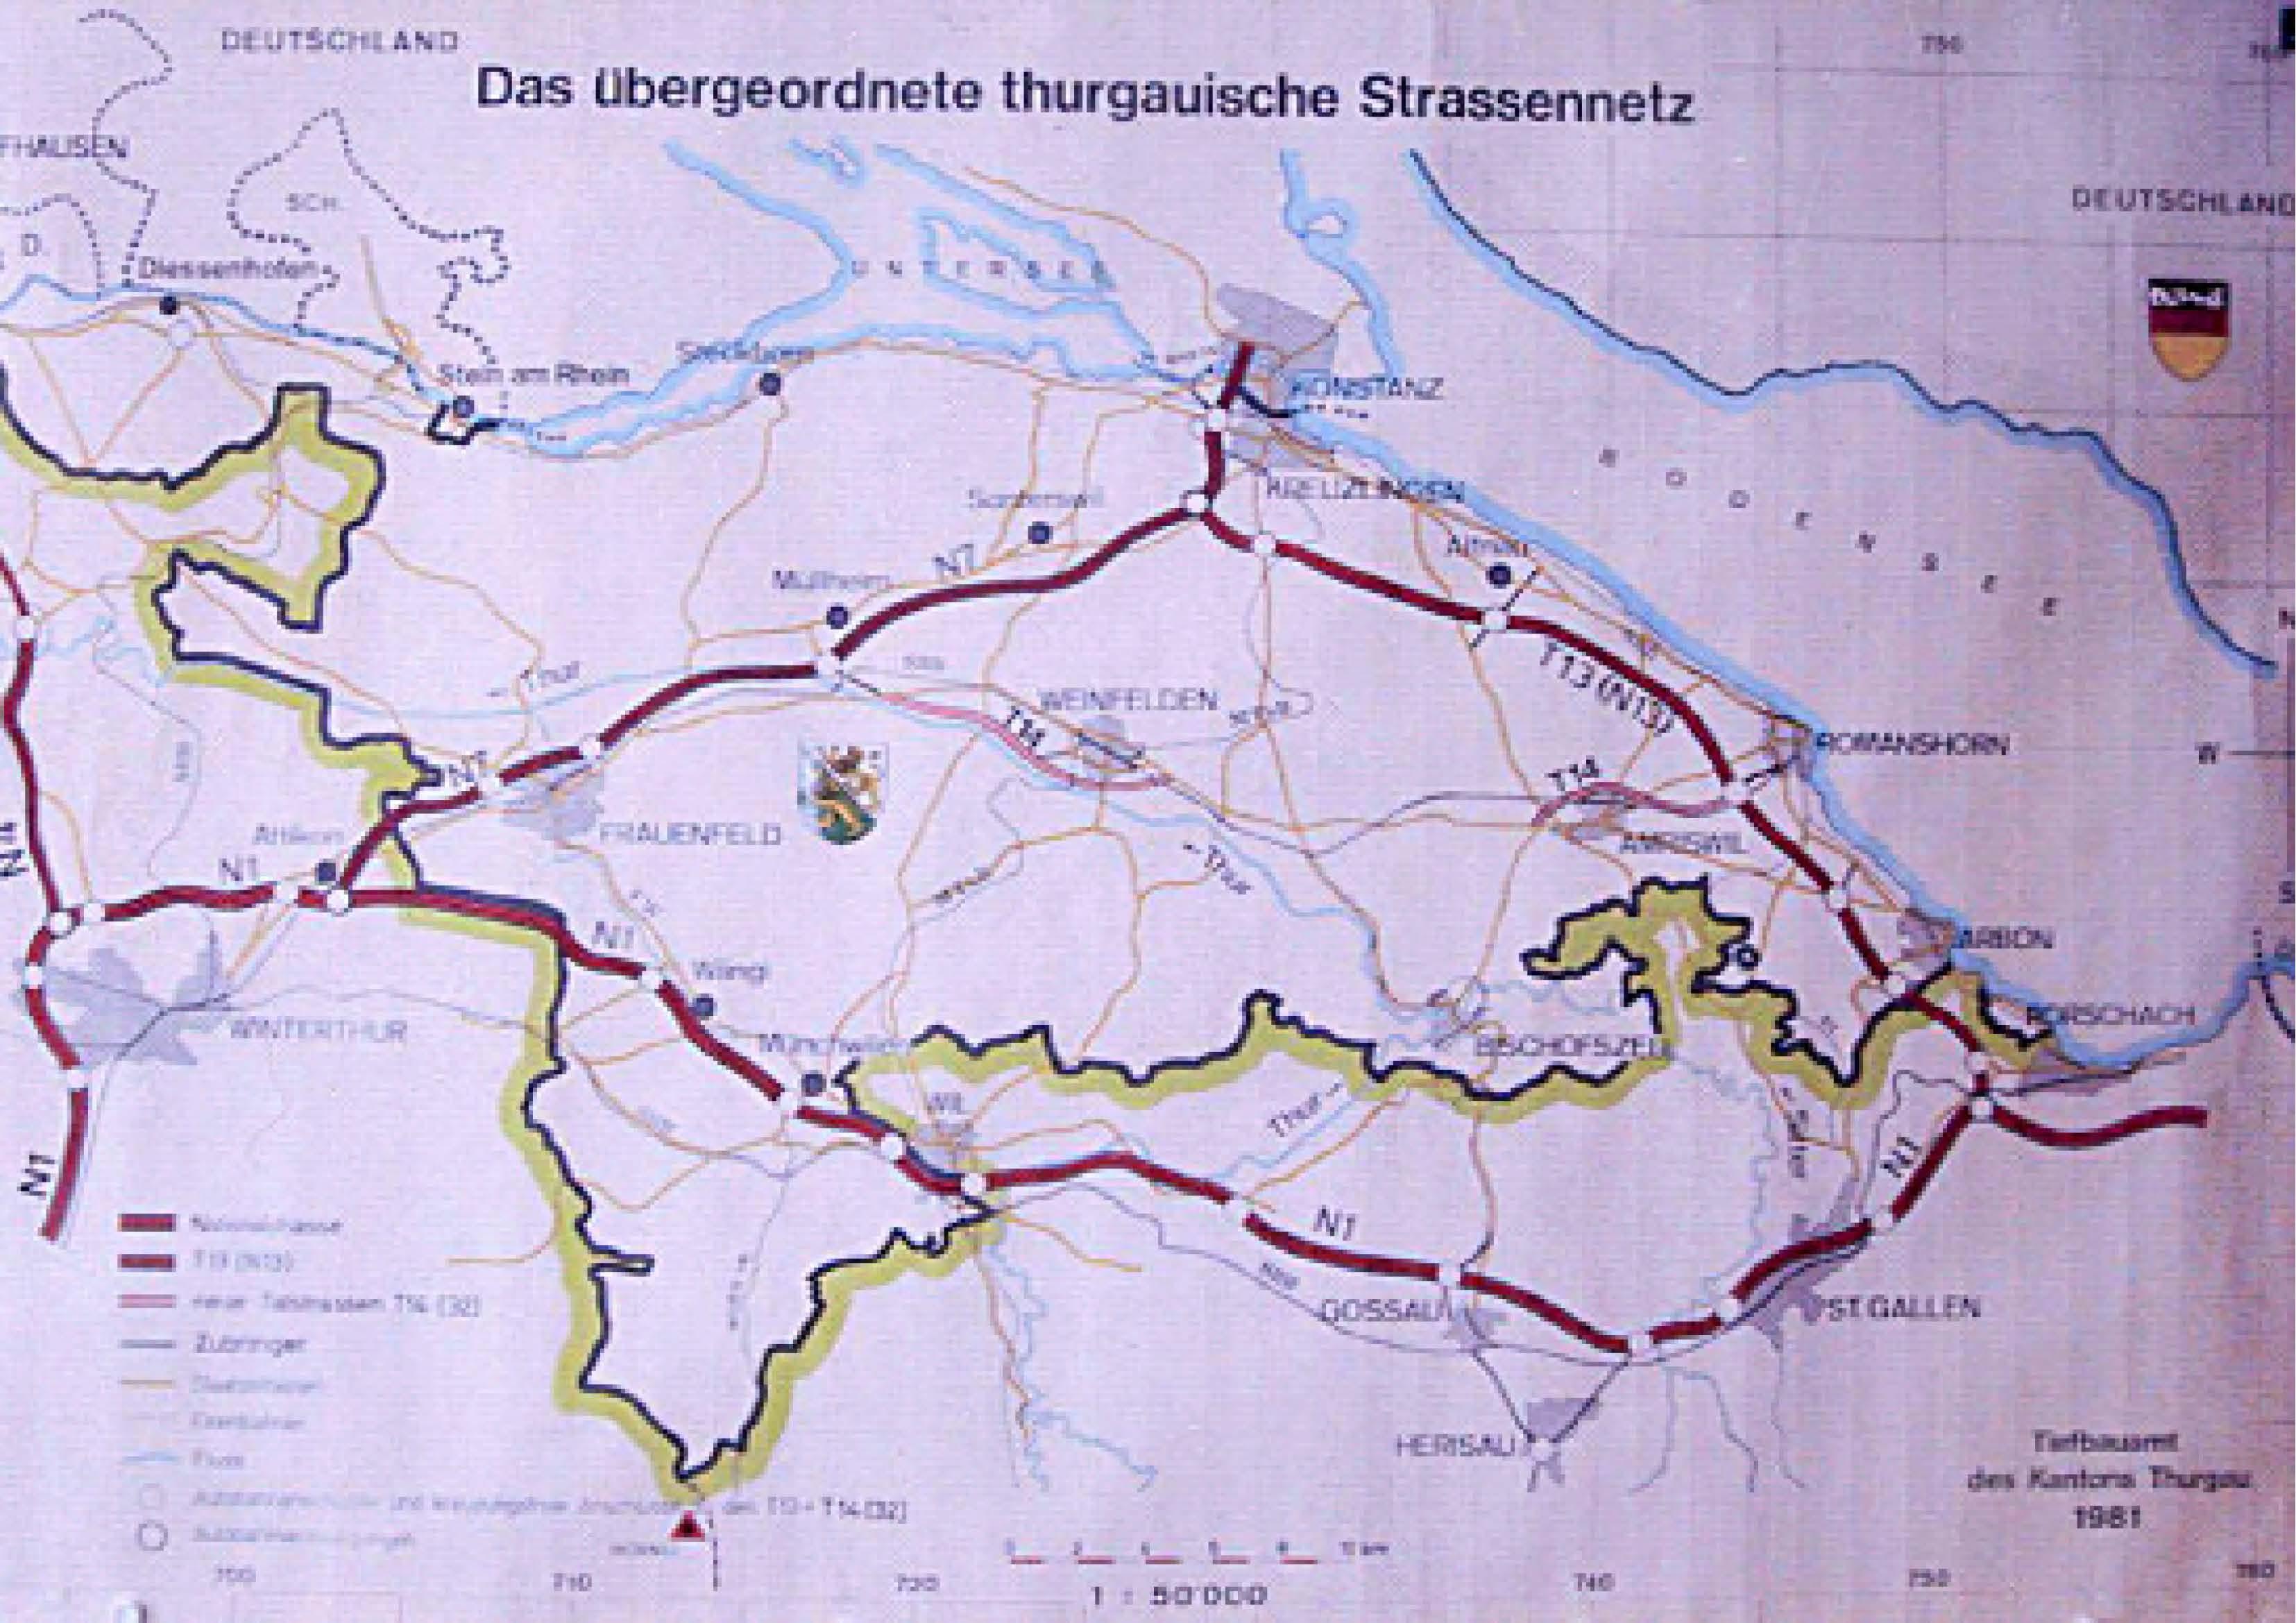 Strassennetz Kanton Thurgau 1981